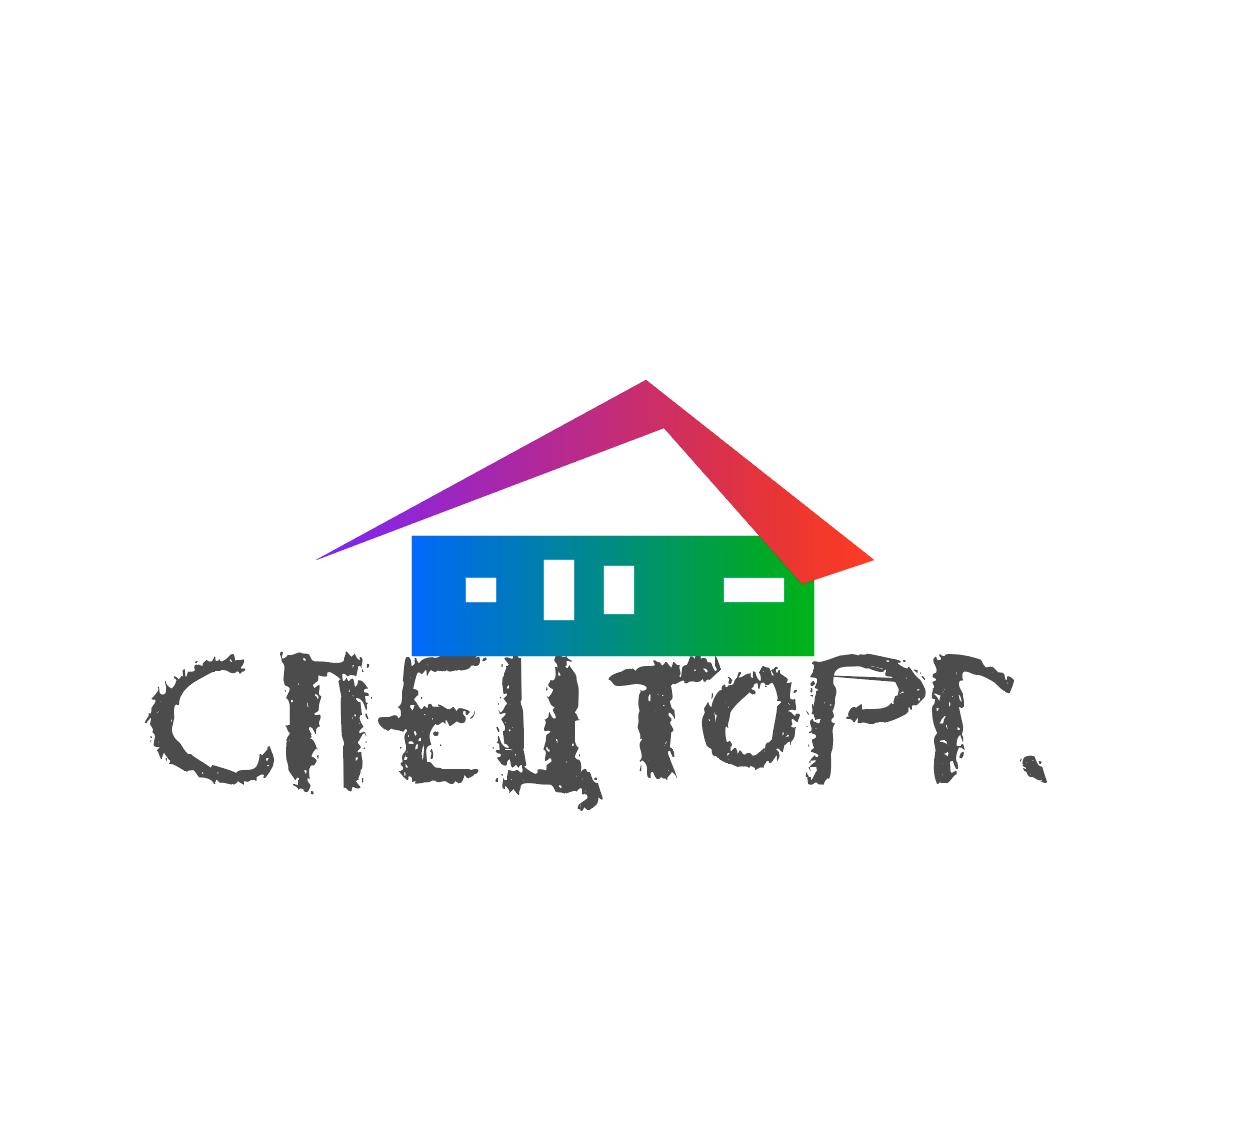 Разработать дизайн  логотипа компании фото f_3435dc28560ad175.png